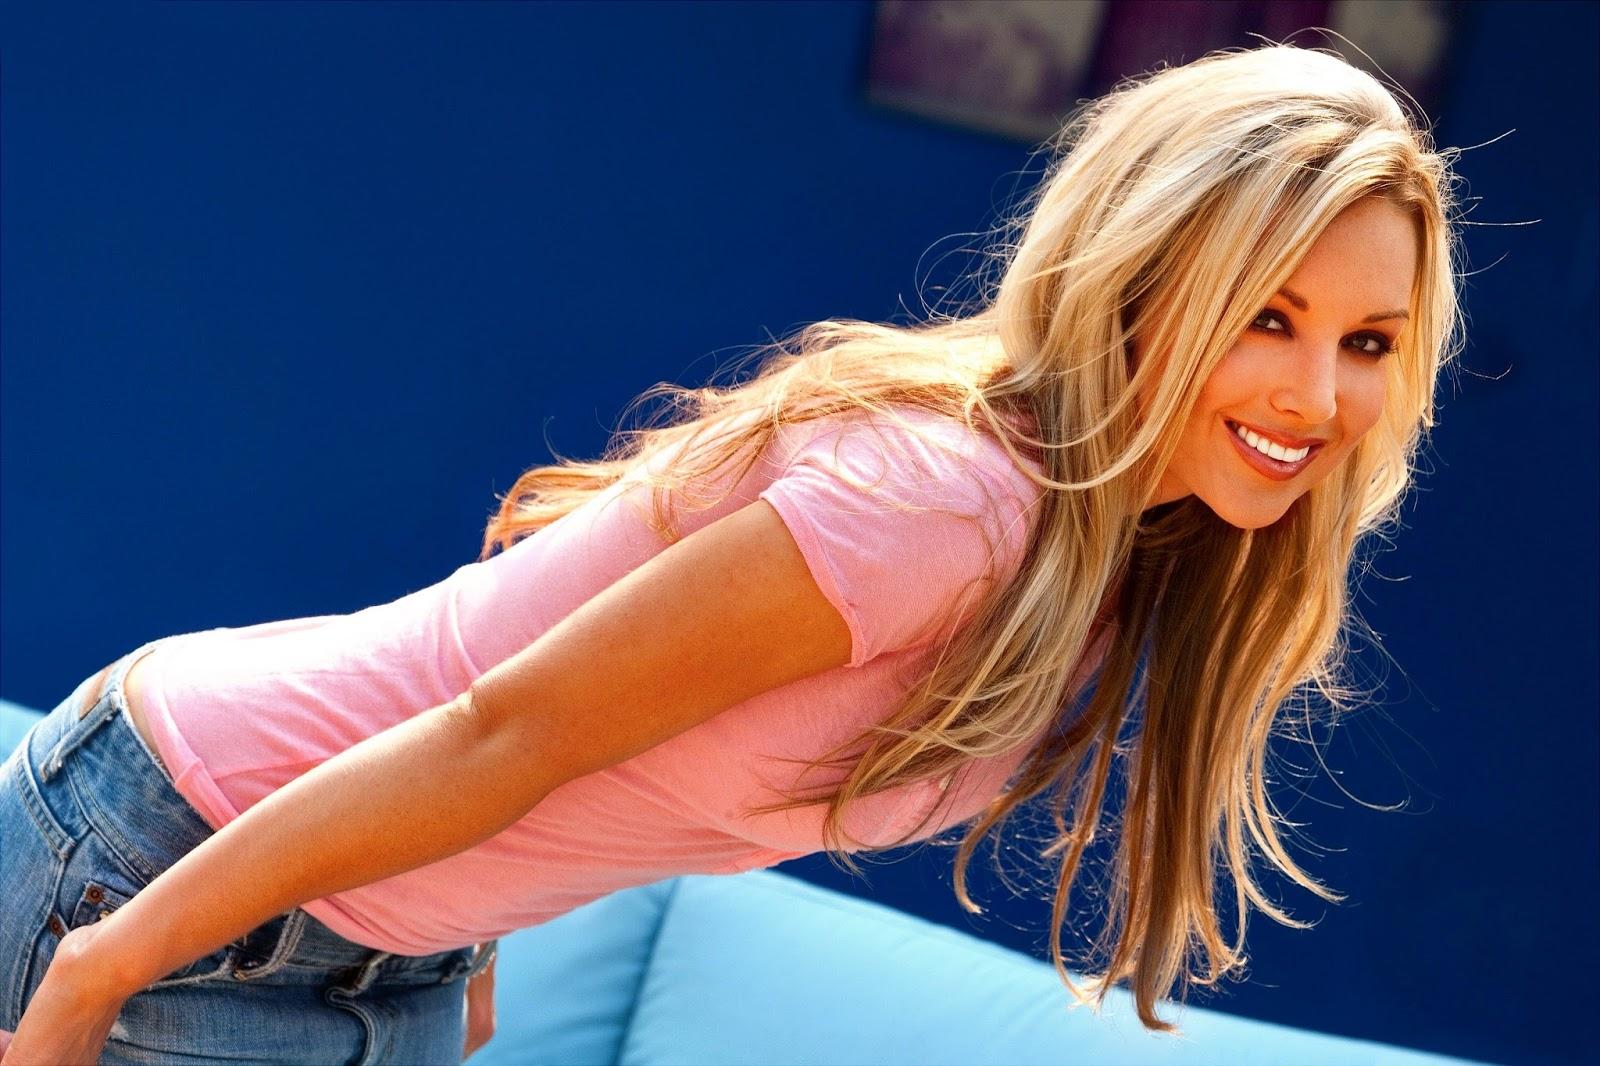 kayden kross smiling image